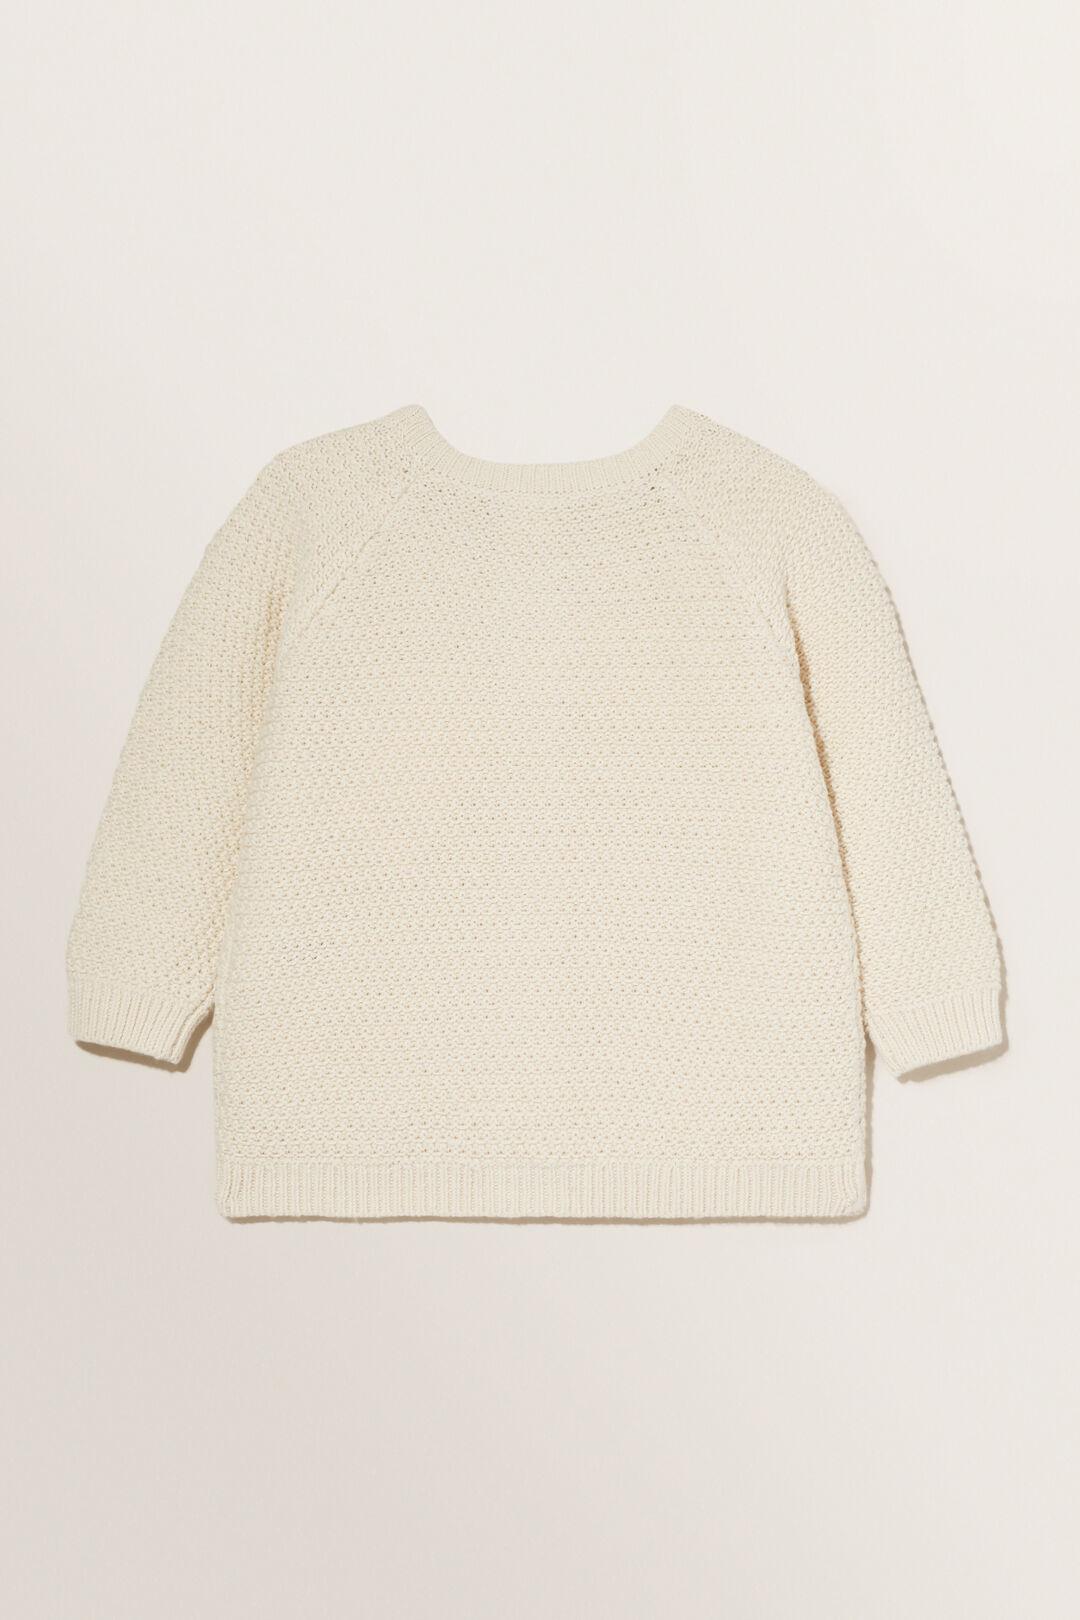 Knit Cardigan  RICH CREAM  hi-res